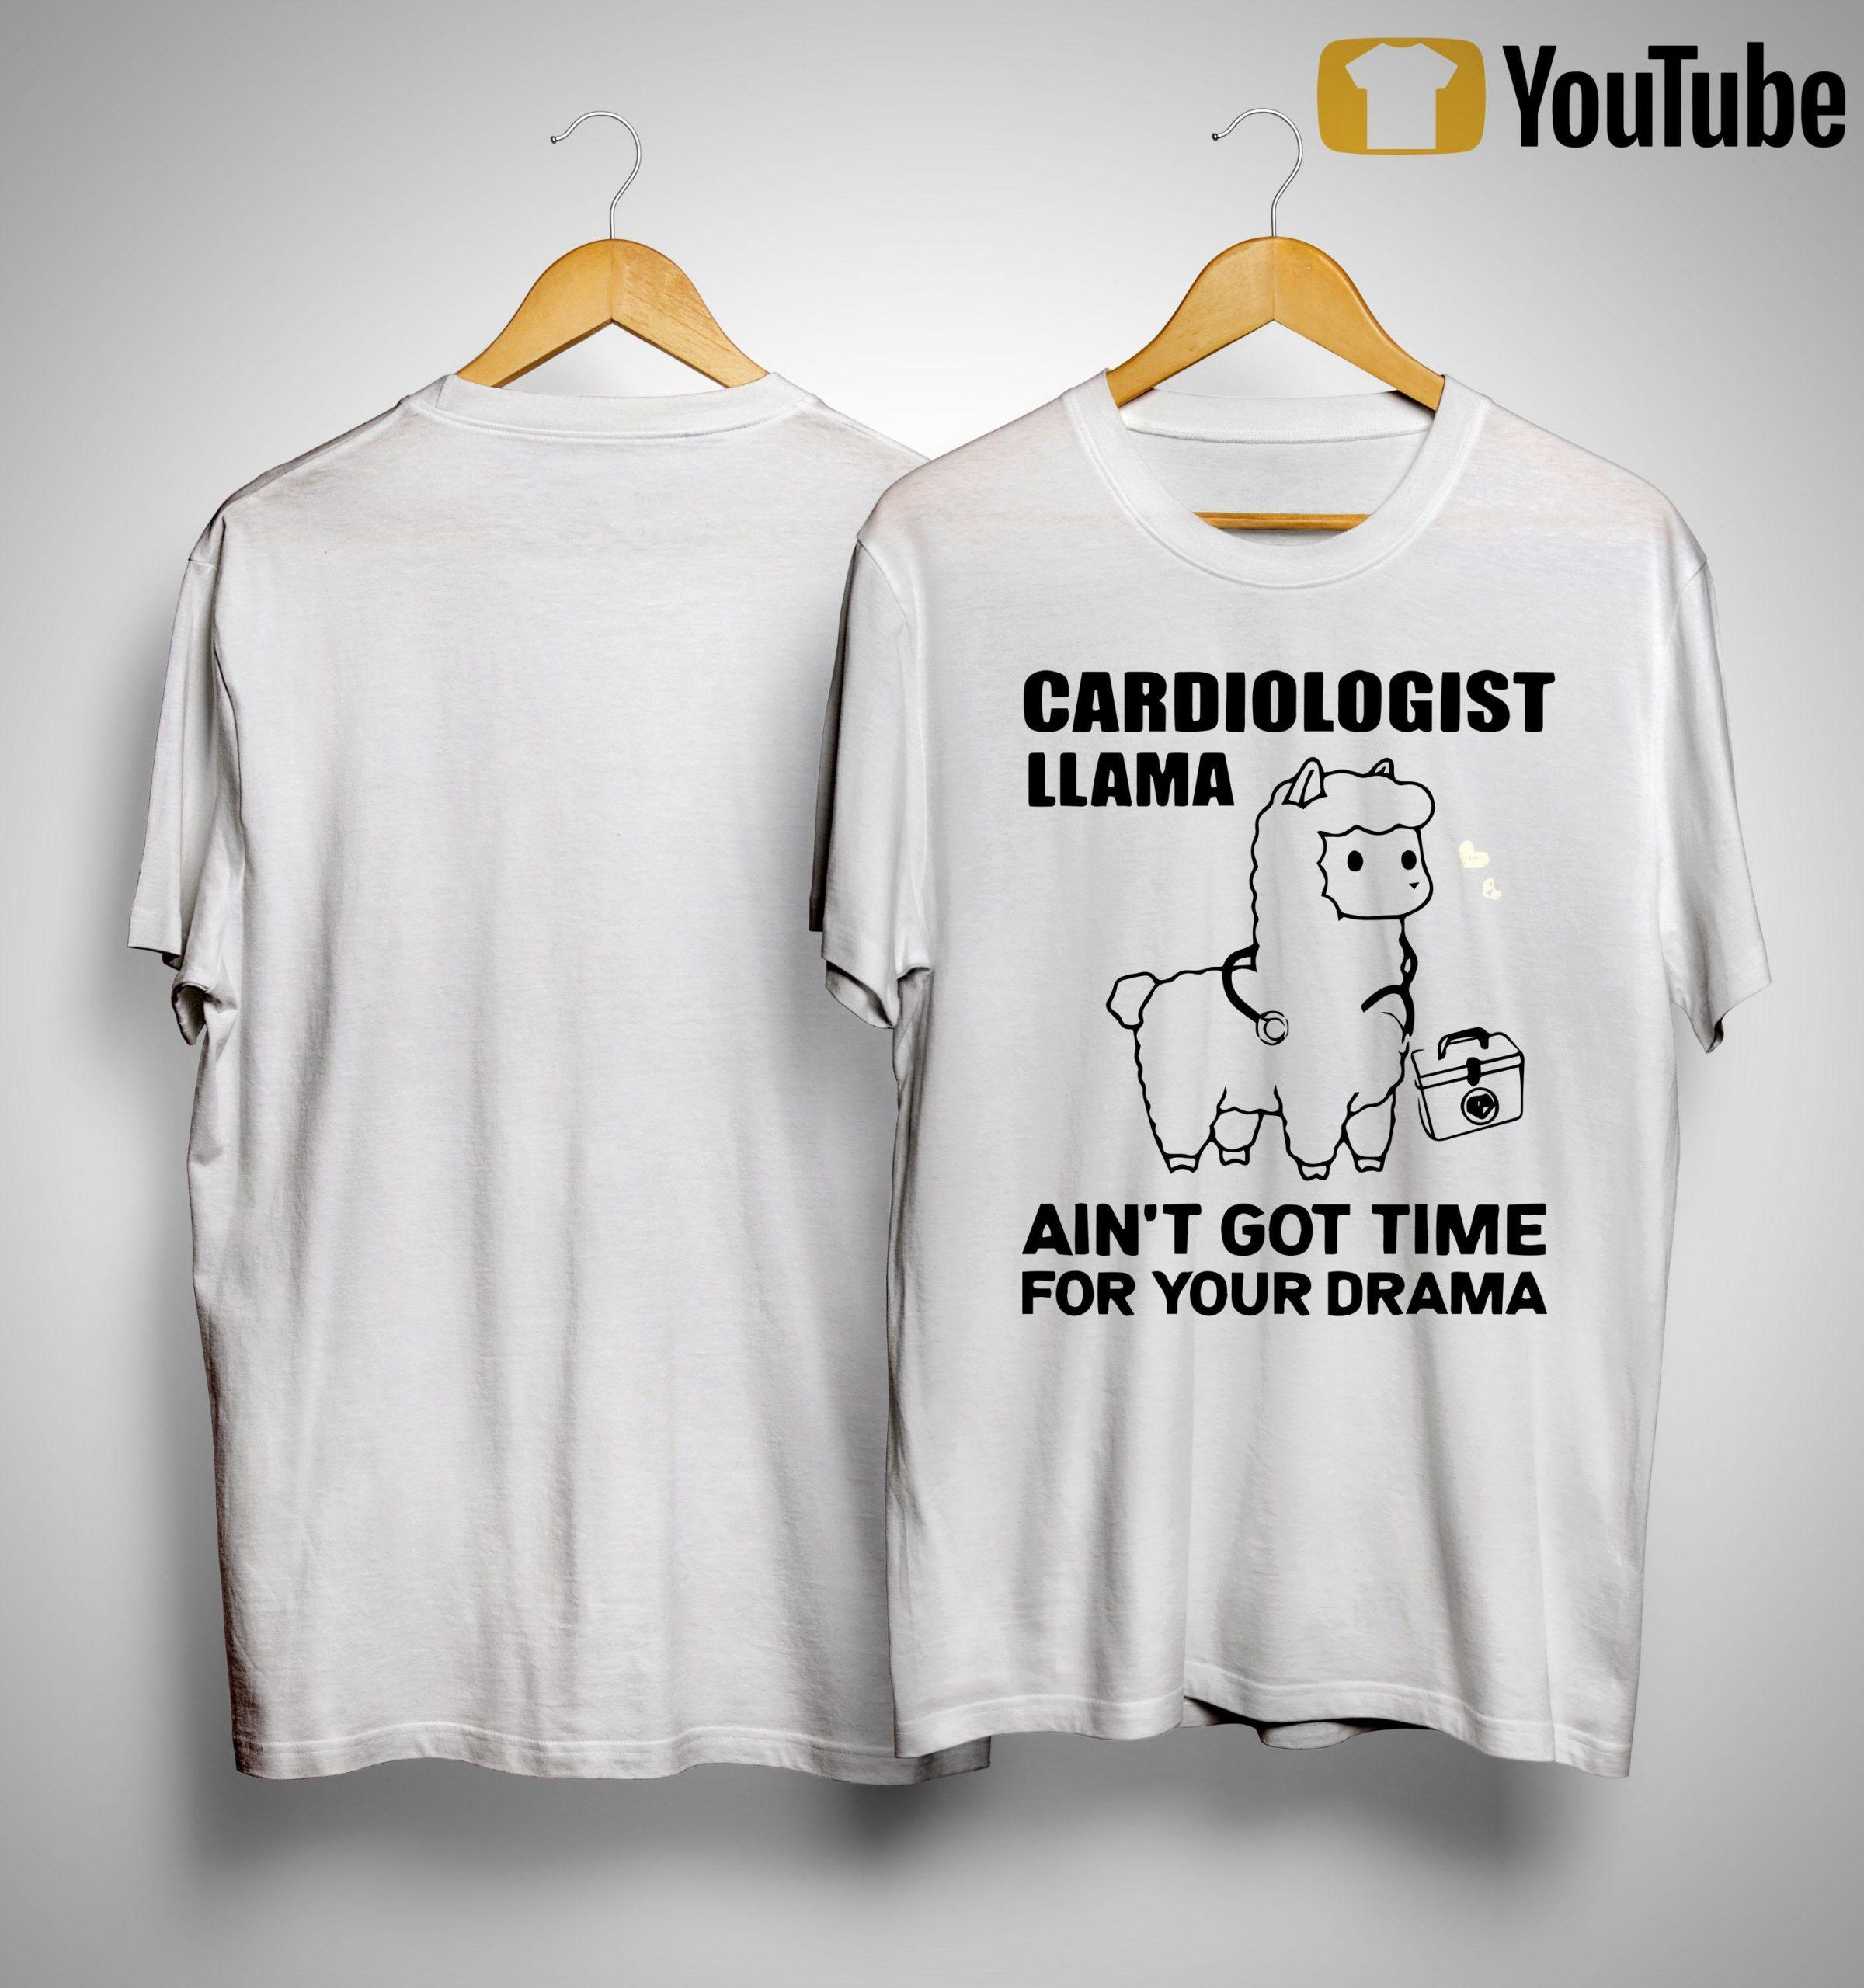 Cardiologist Llama Ain't Got Time For Your Drama Shirt